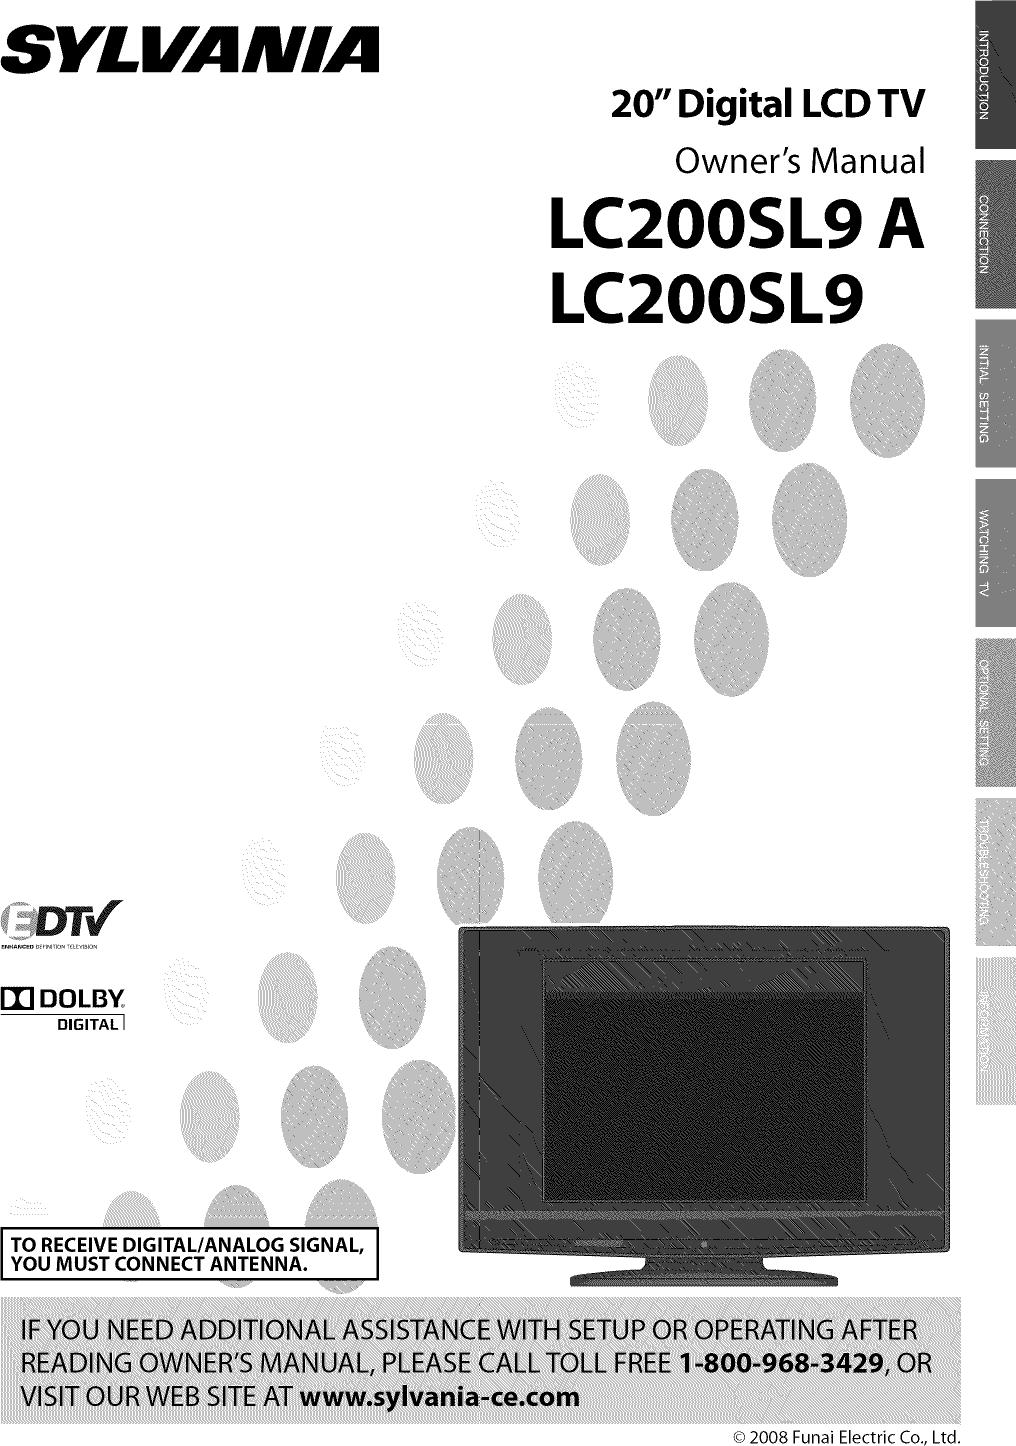 Sylvania Lc200Sl9 20 Lcd Tv Users Manual